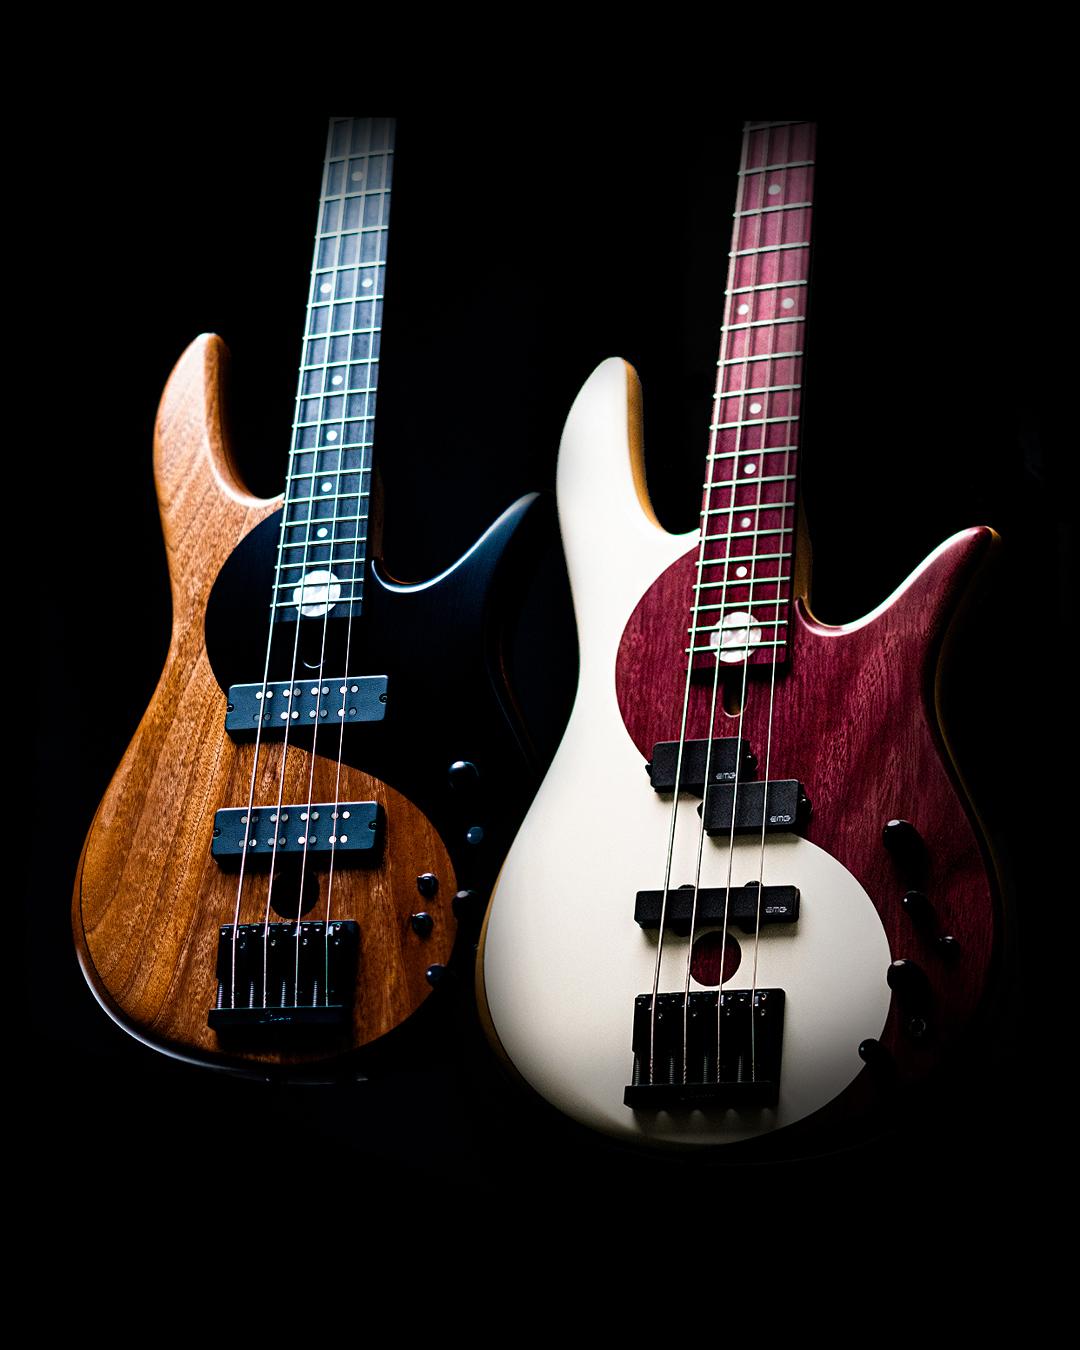 Mahogany and Purple Heart Yin Yang Series Bass Guitars Banner in Black